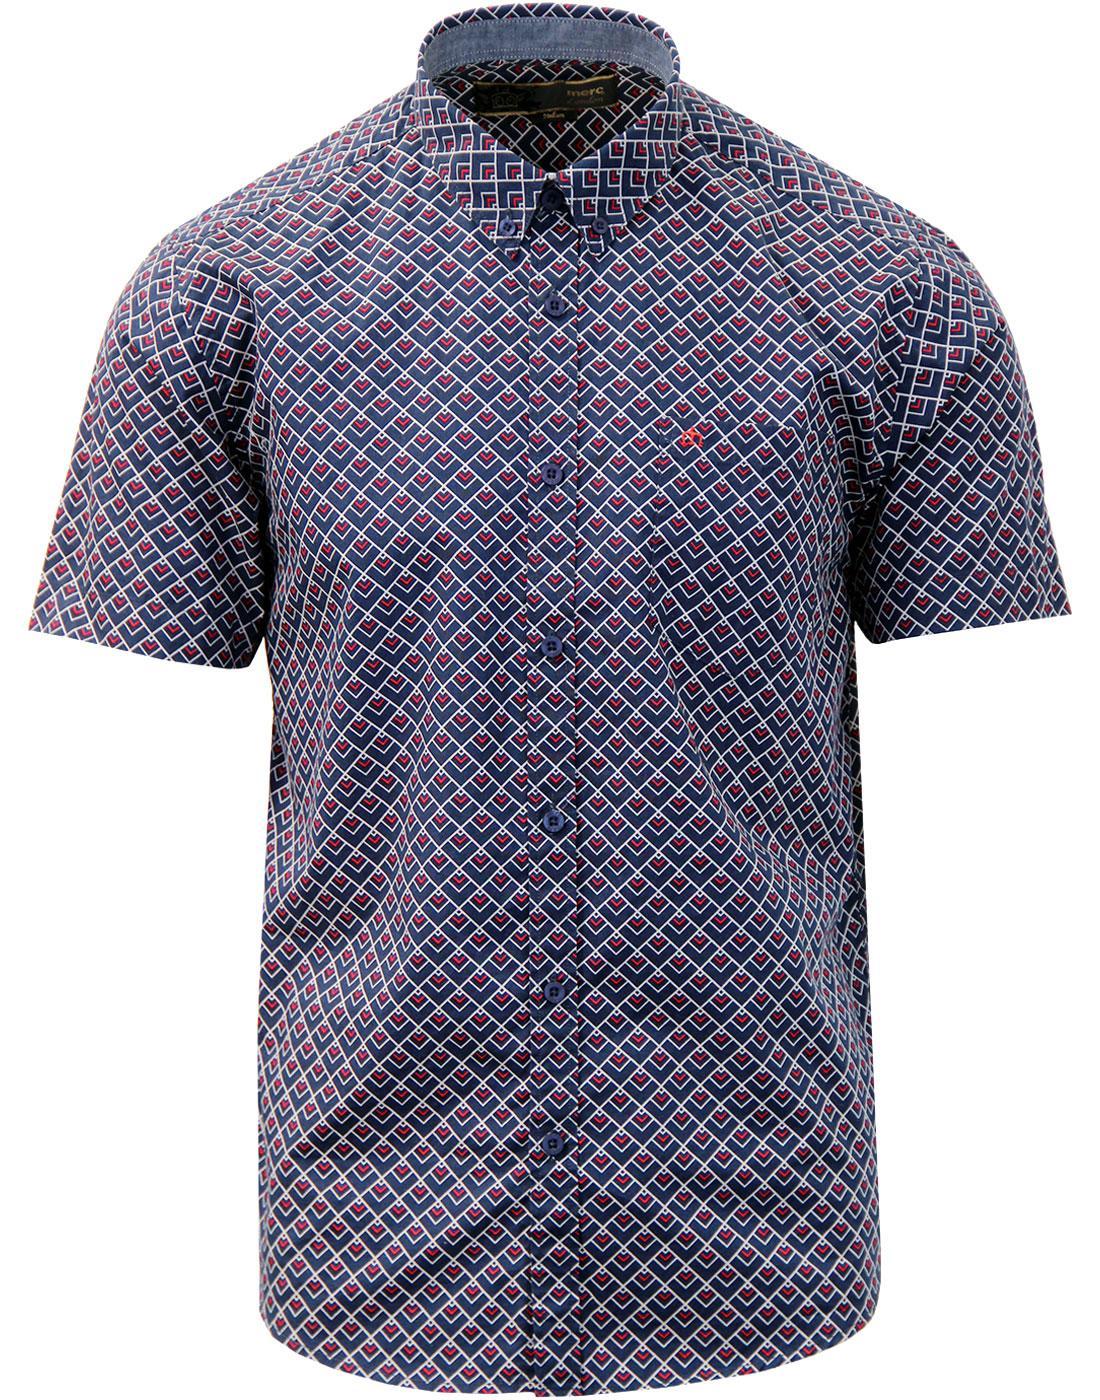 Garrison MERC Geo Square Op Art Retro Mod Shirt